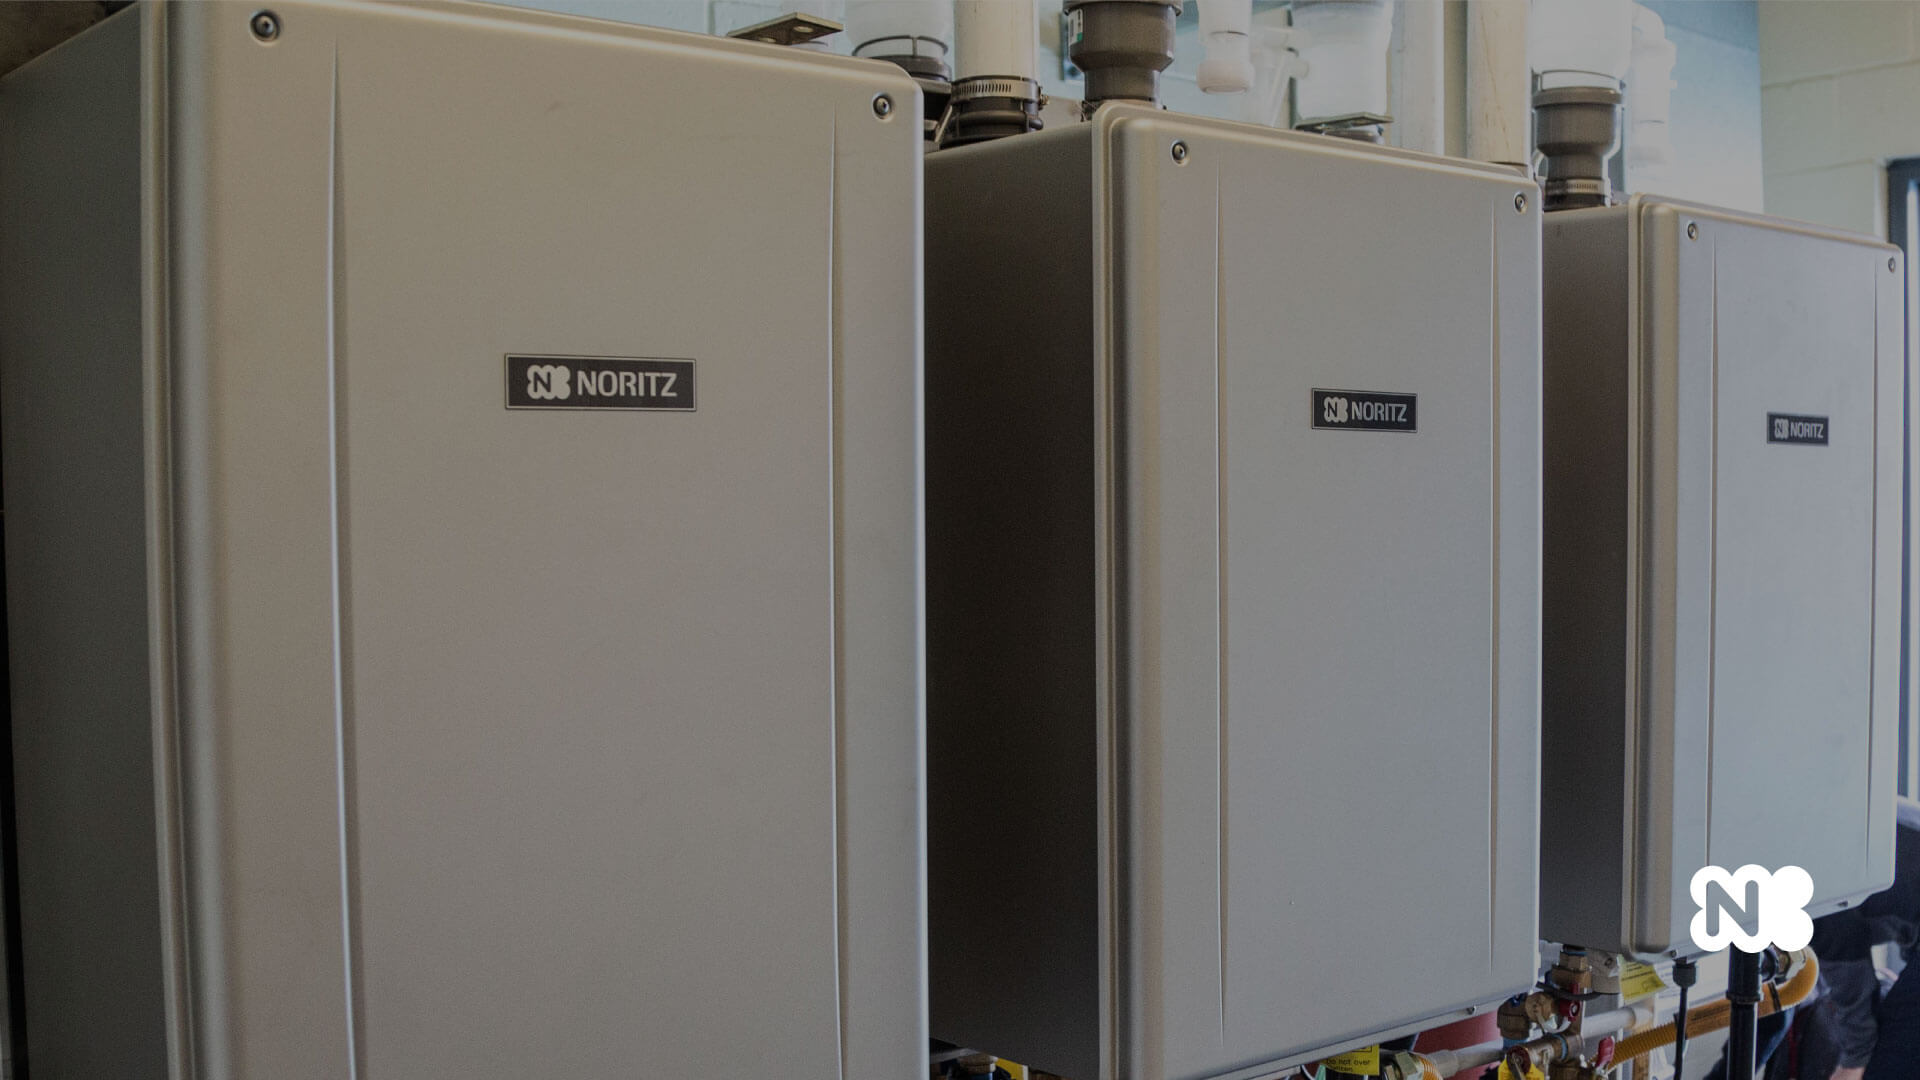 Commercial Water Heater, Commercial Water Heaters, Commercial Tankless Water Heater, Commercial Tankless Water Heaters, Tankless